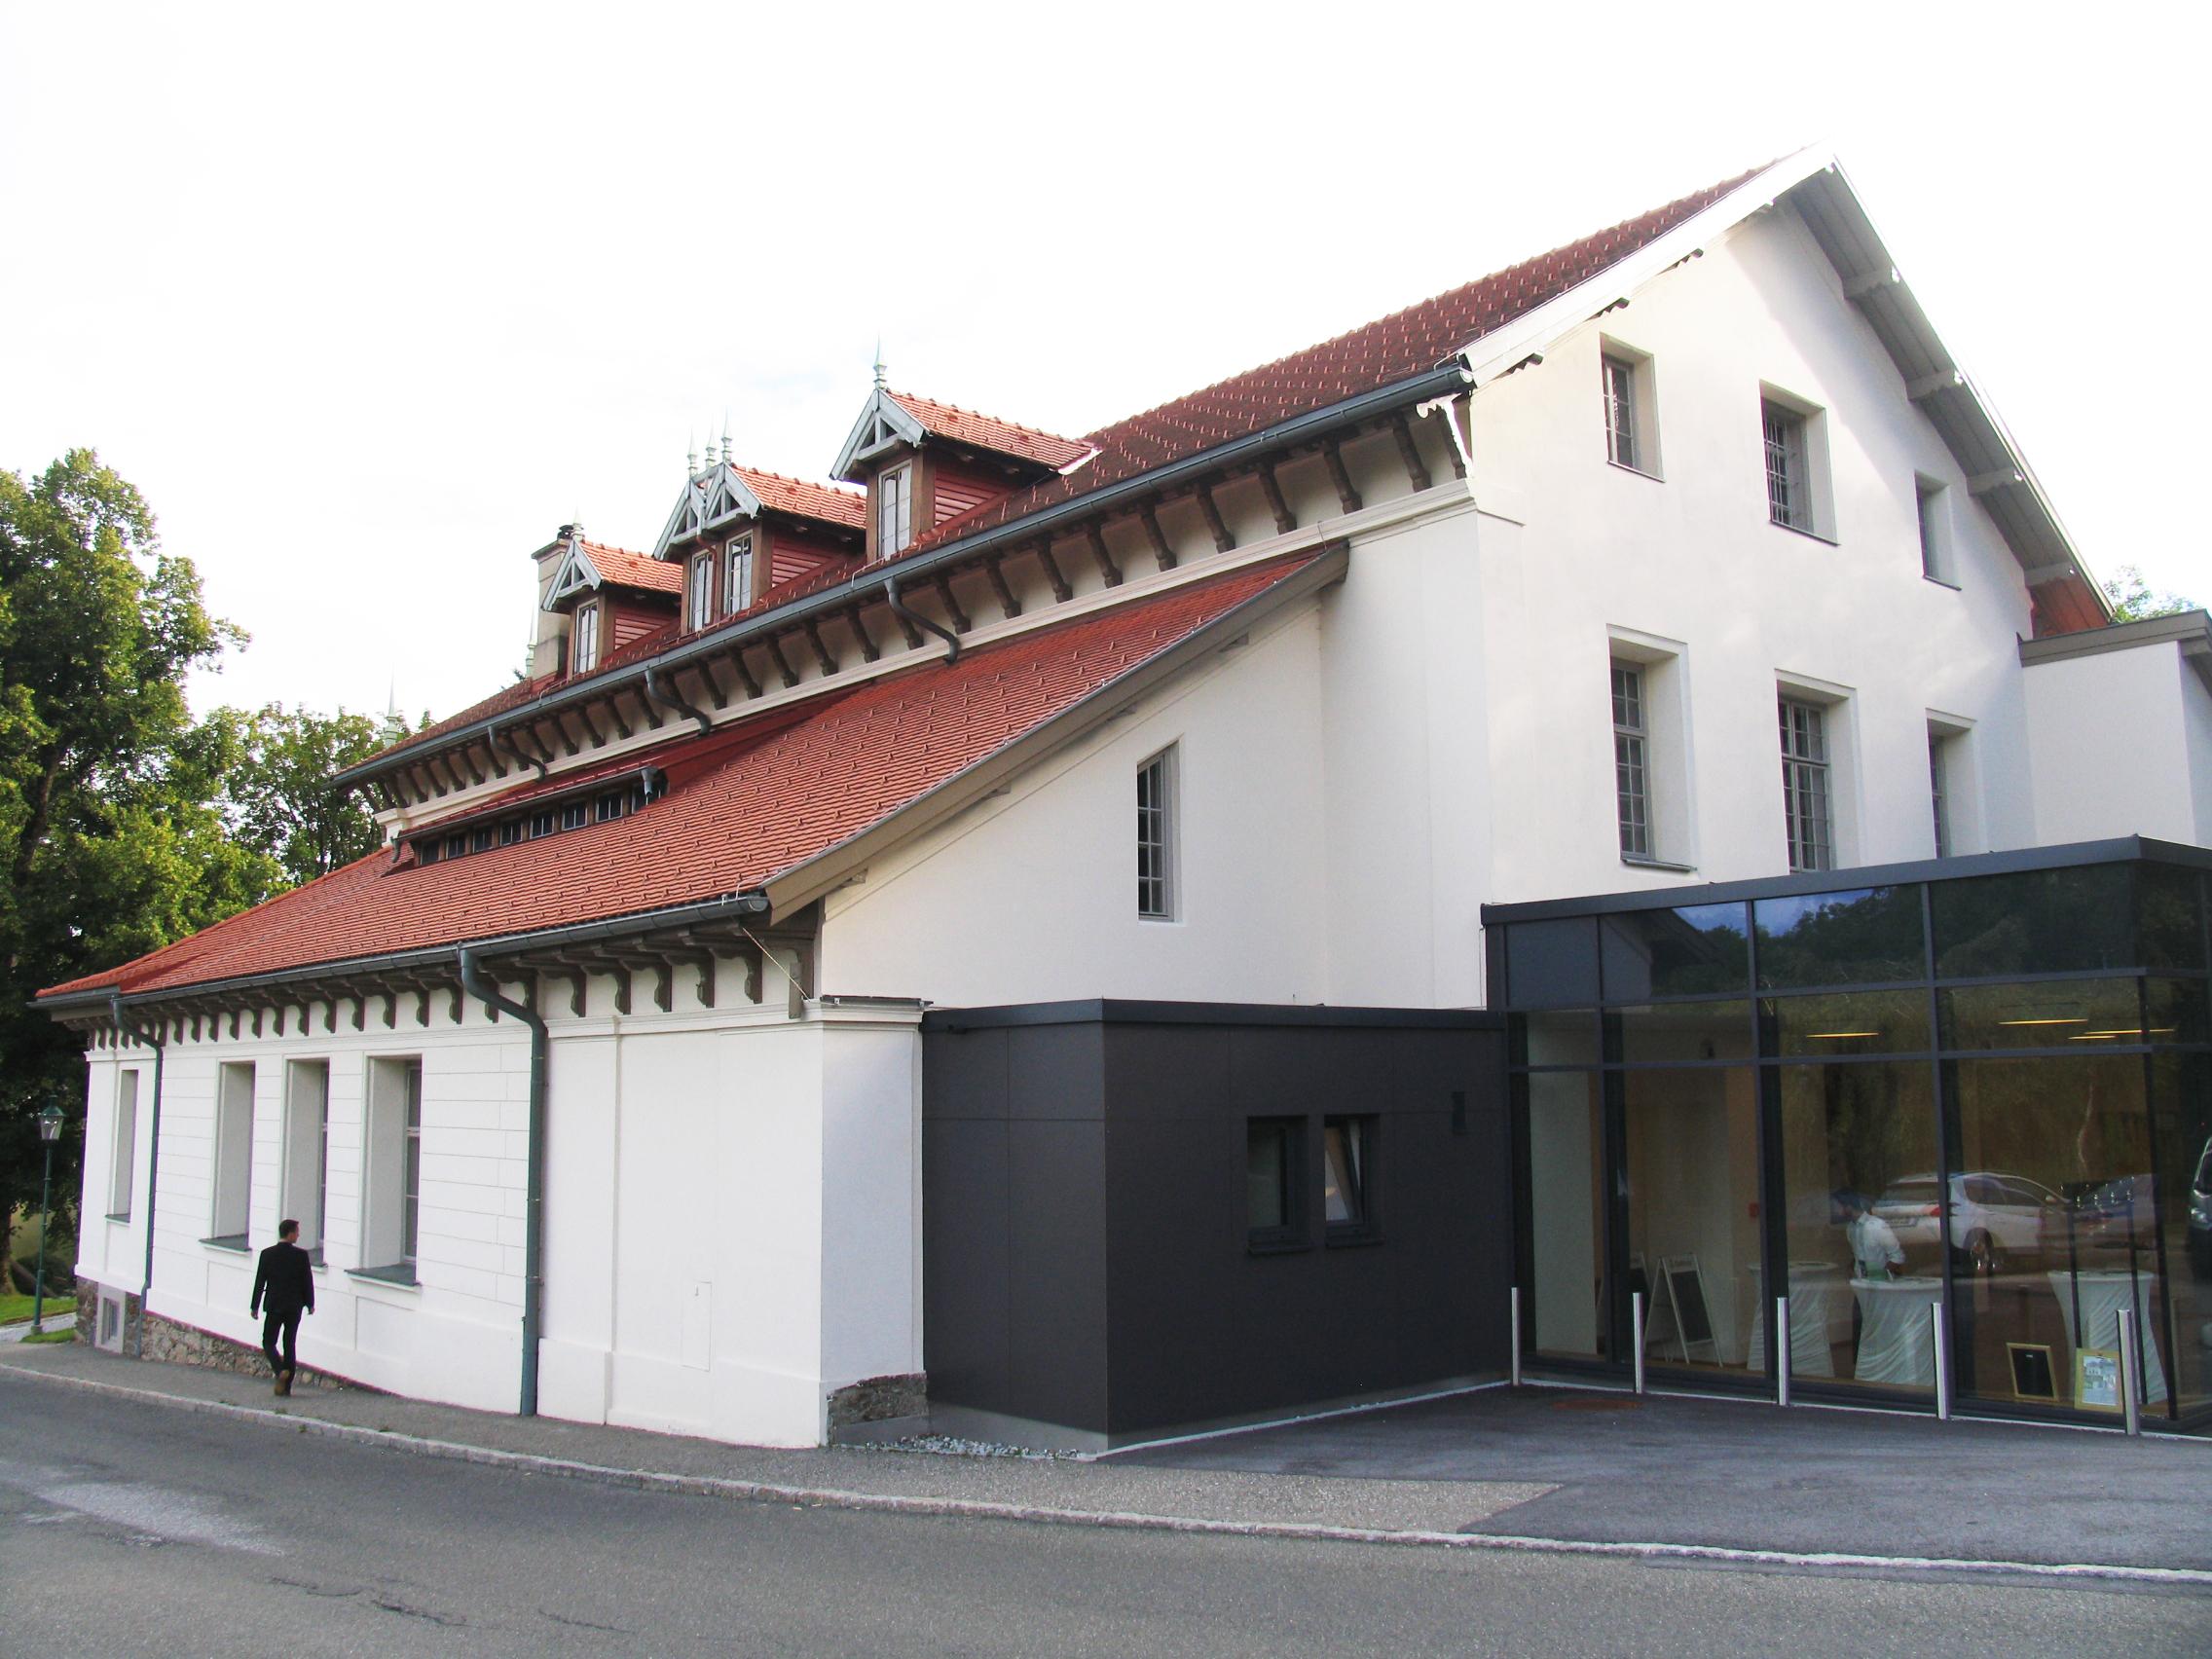 exterior building (2)